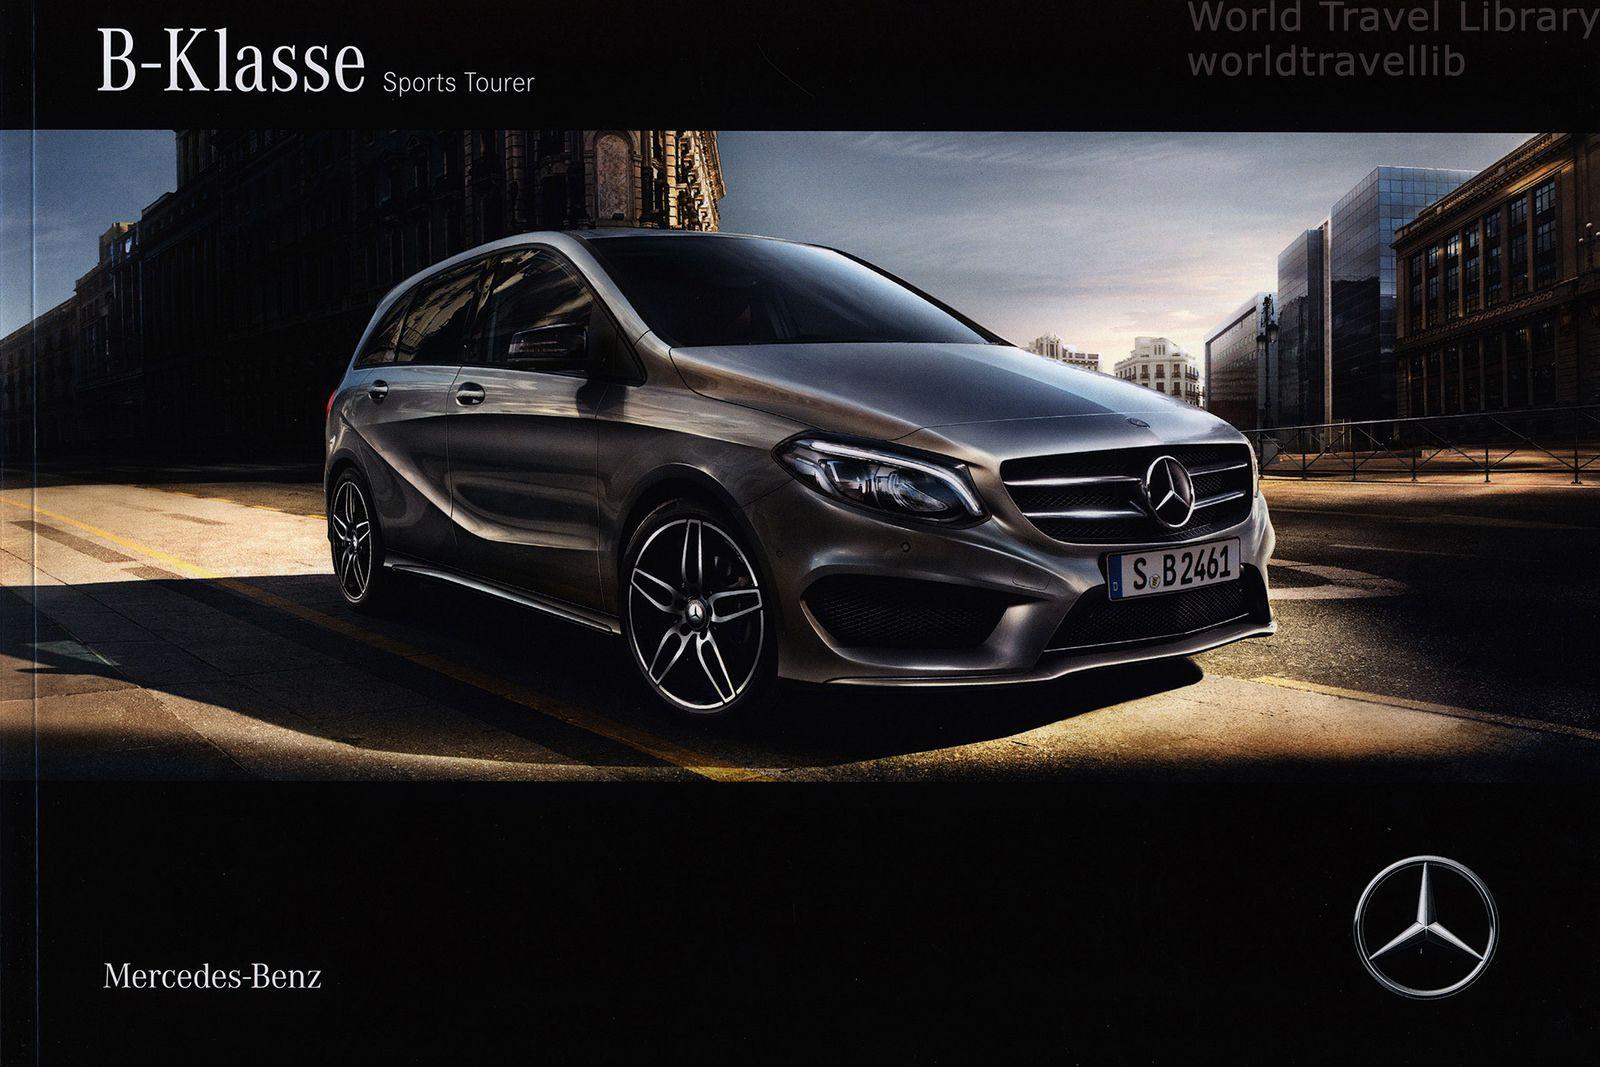 https://flic.kr/p/Tat8qC | Mercedes-Benz B-Klasse / B-Class Sports Tourer; 2016